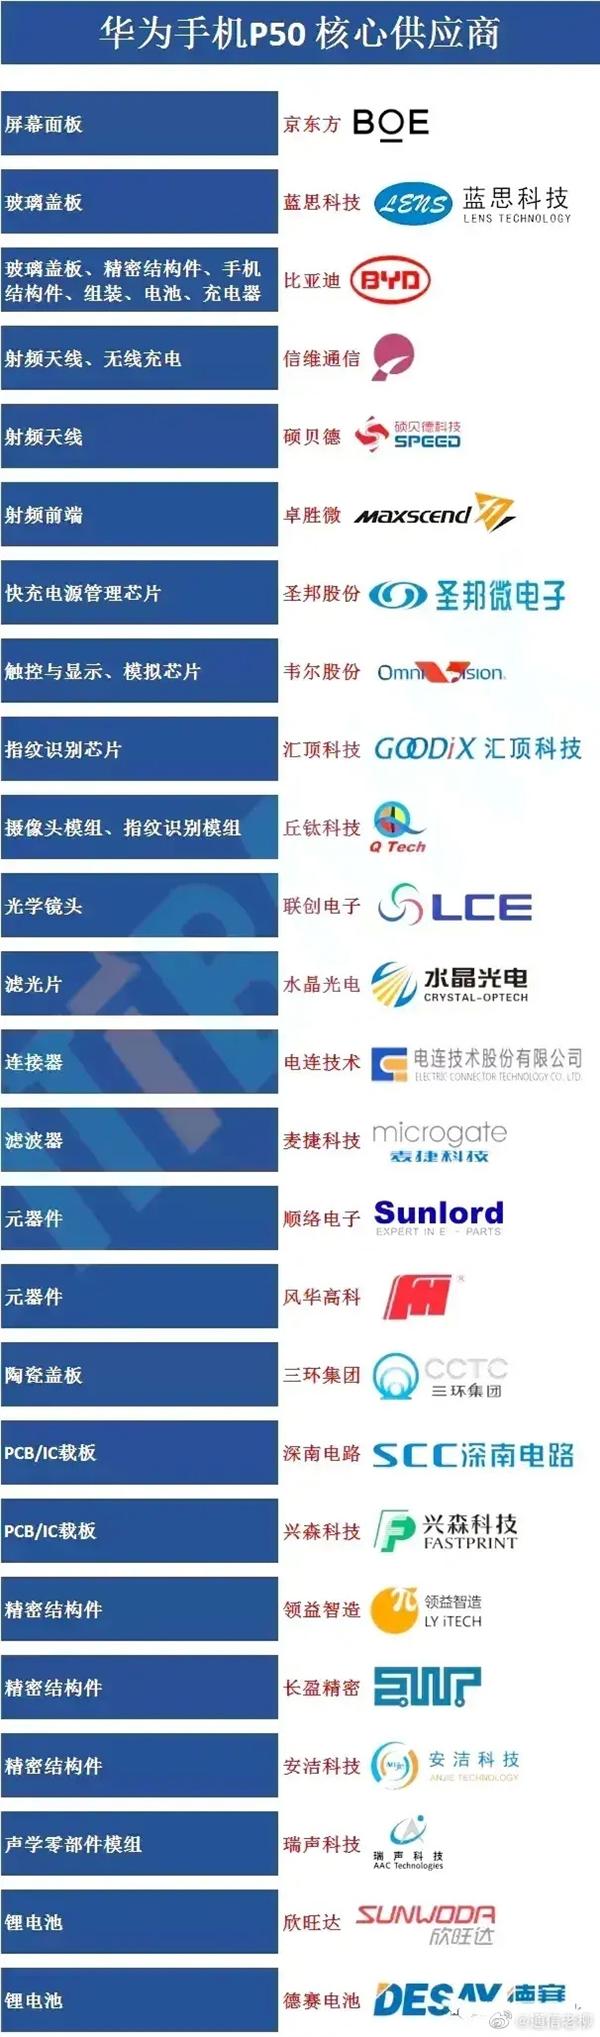 P50核心供应商曝光:国产厂商成主力